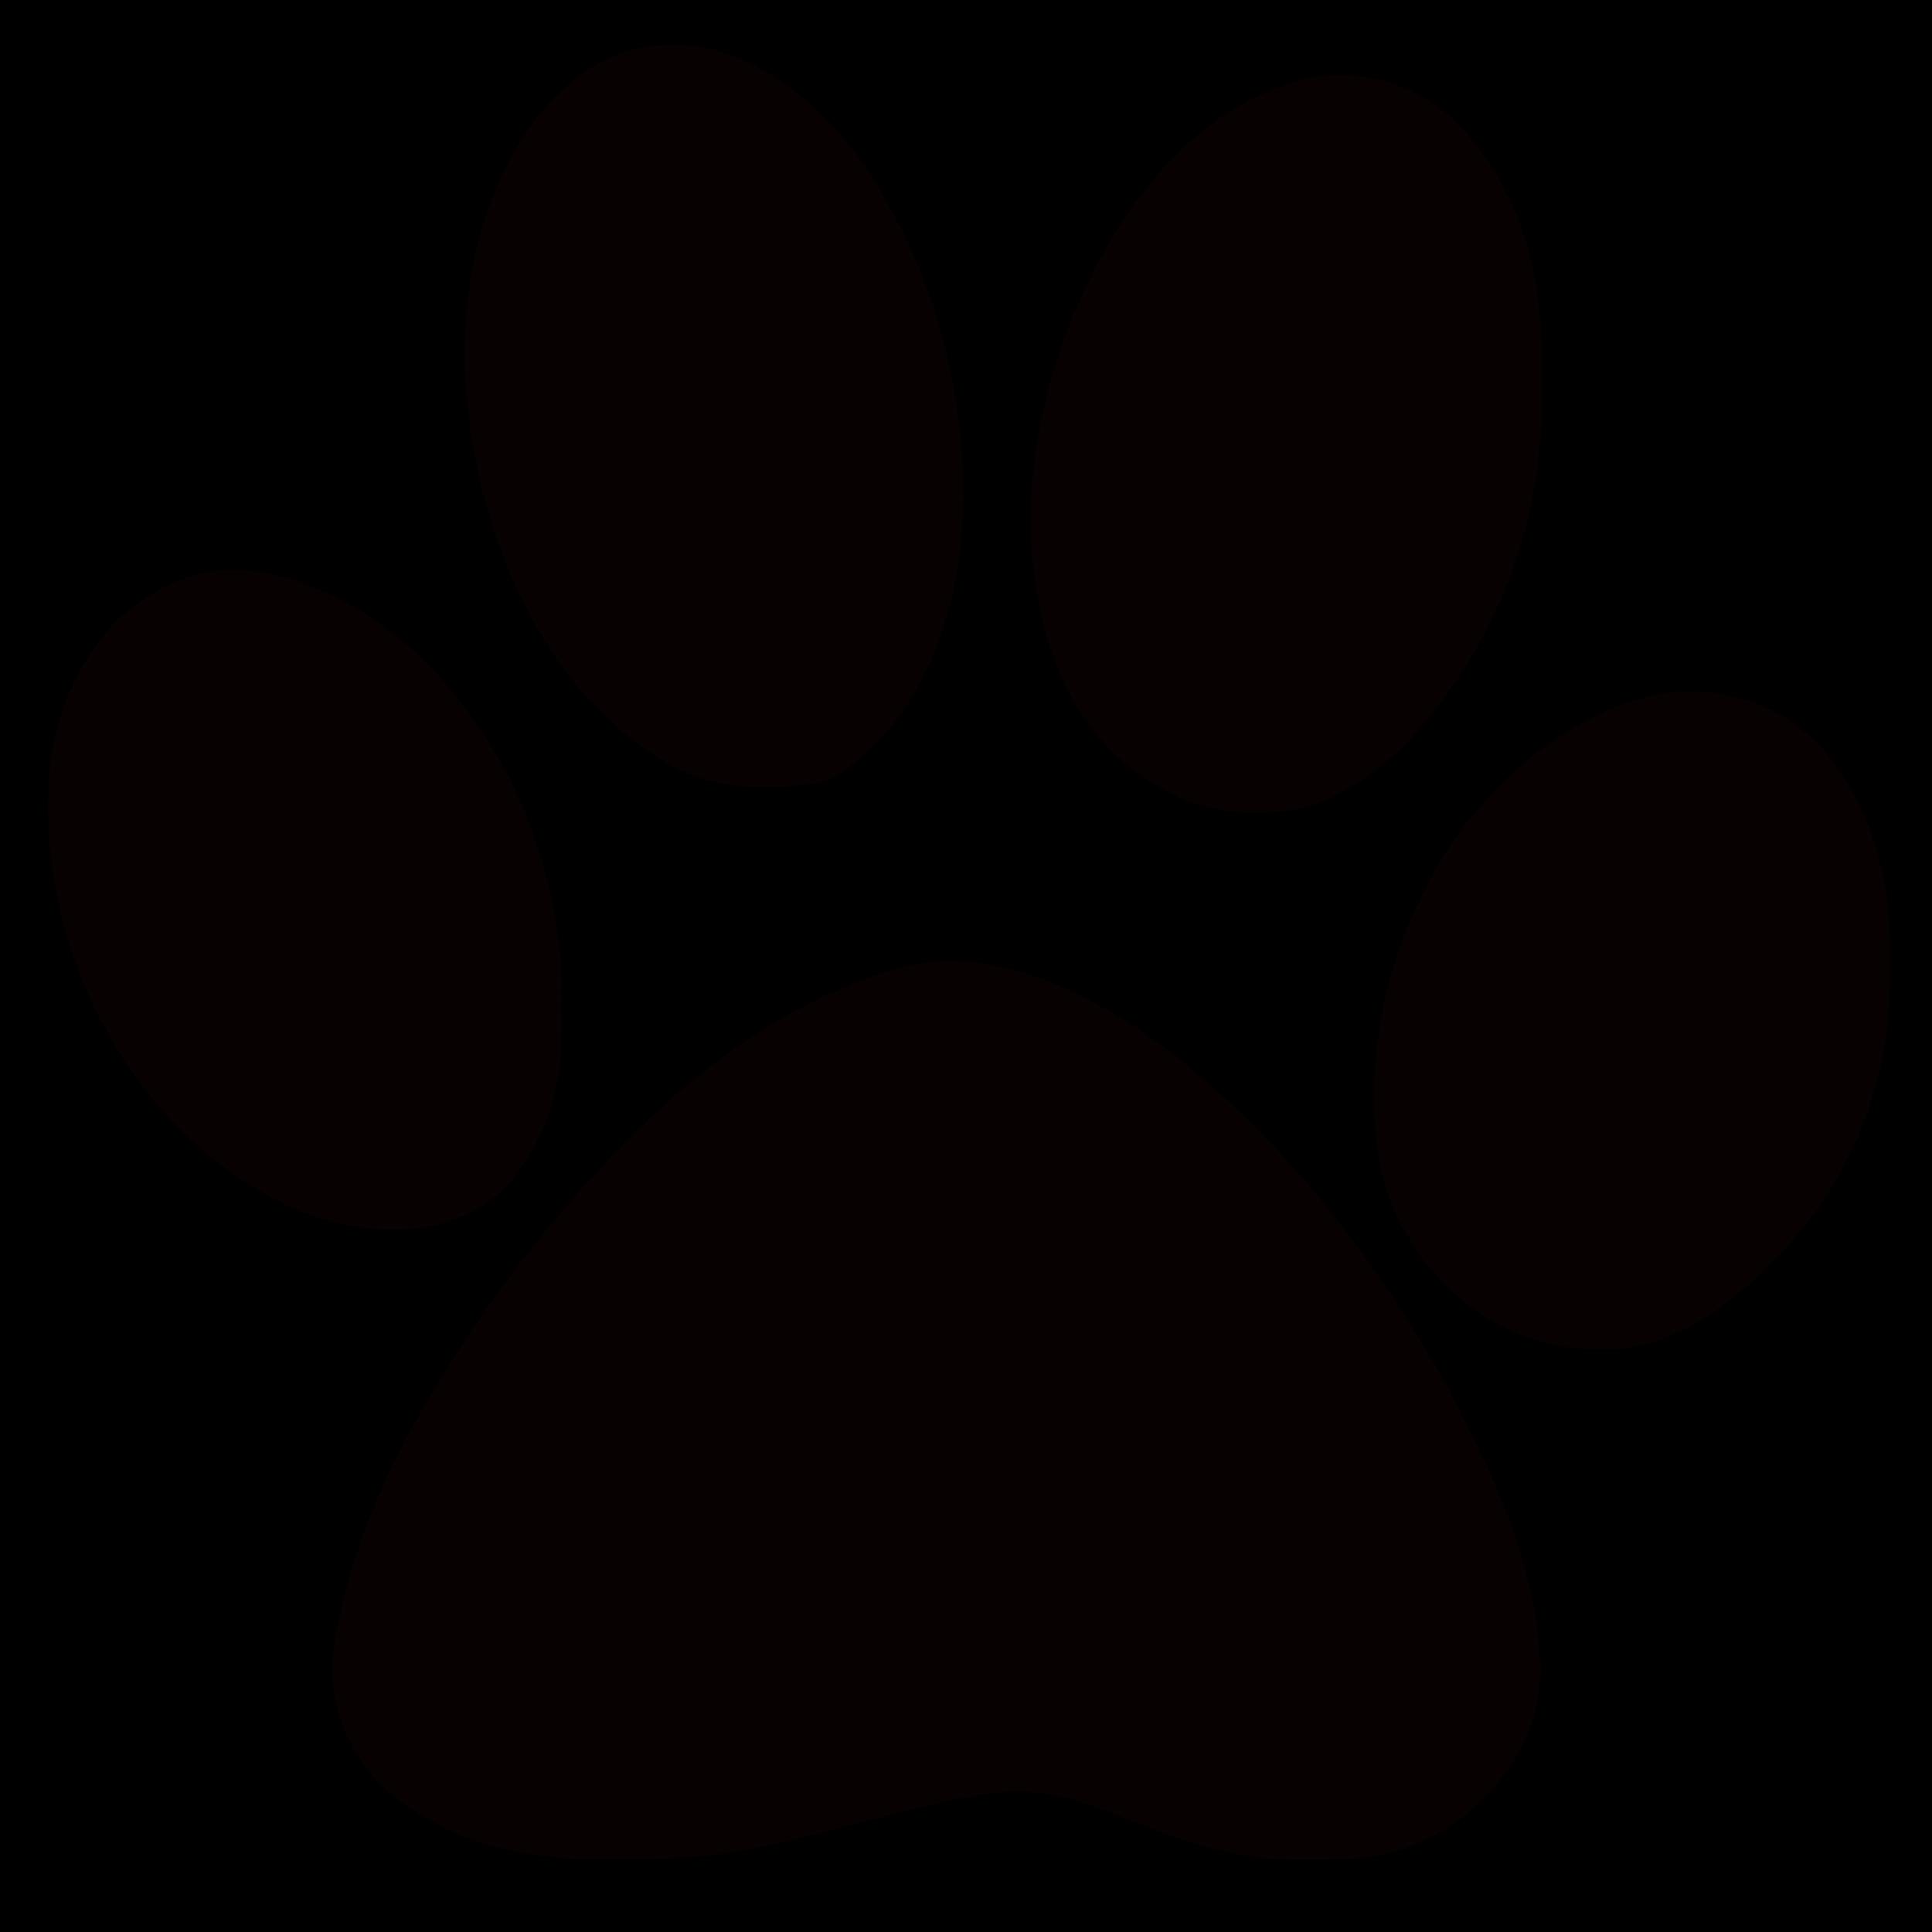 Dog paw print free download clip art on